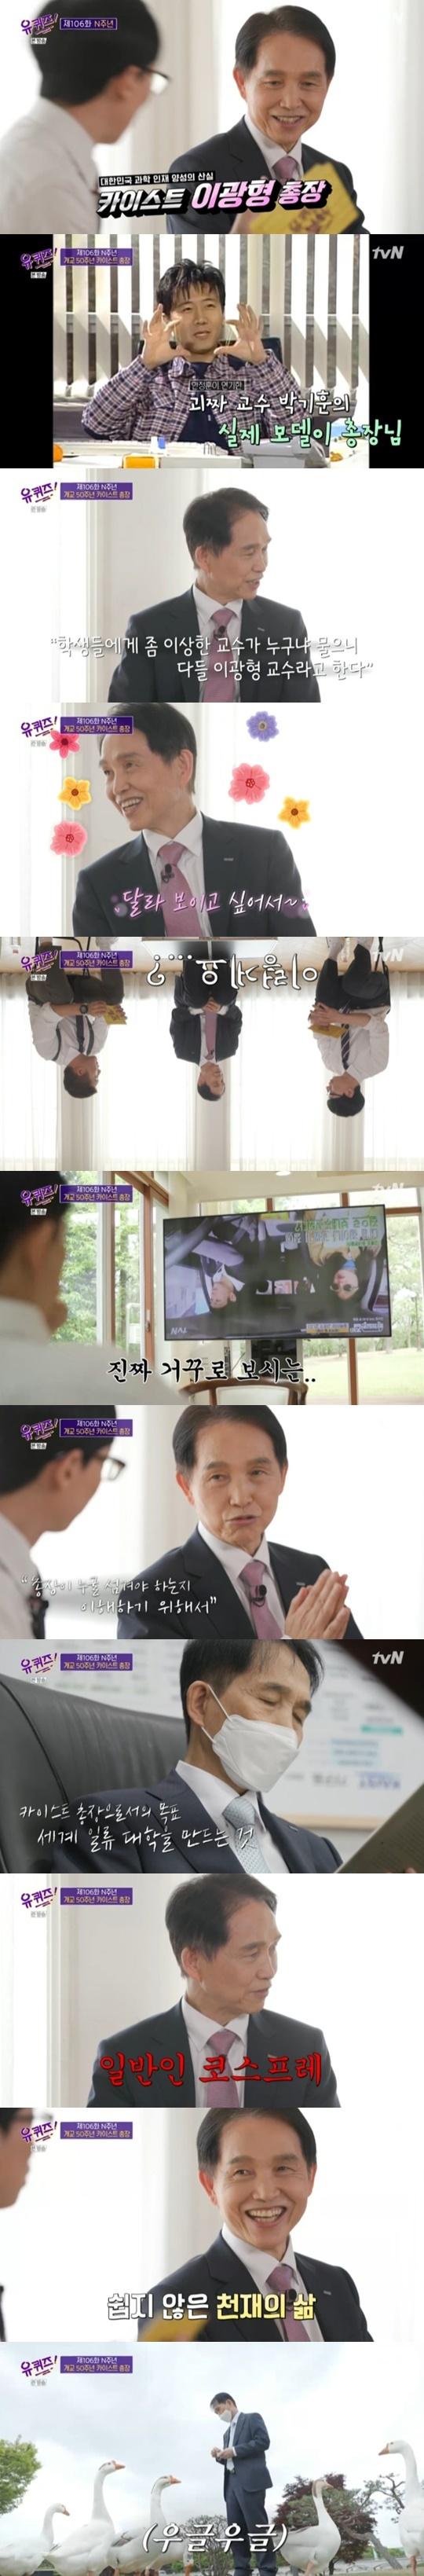 [RE:TV] 카이스트 총장 이광형, 드라마 '카이스트' 괴짜교수 실제 모델…